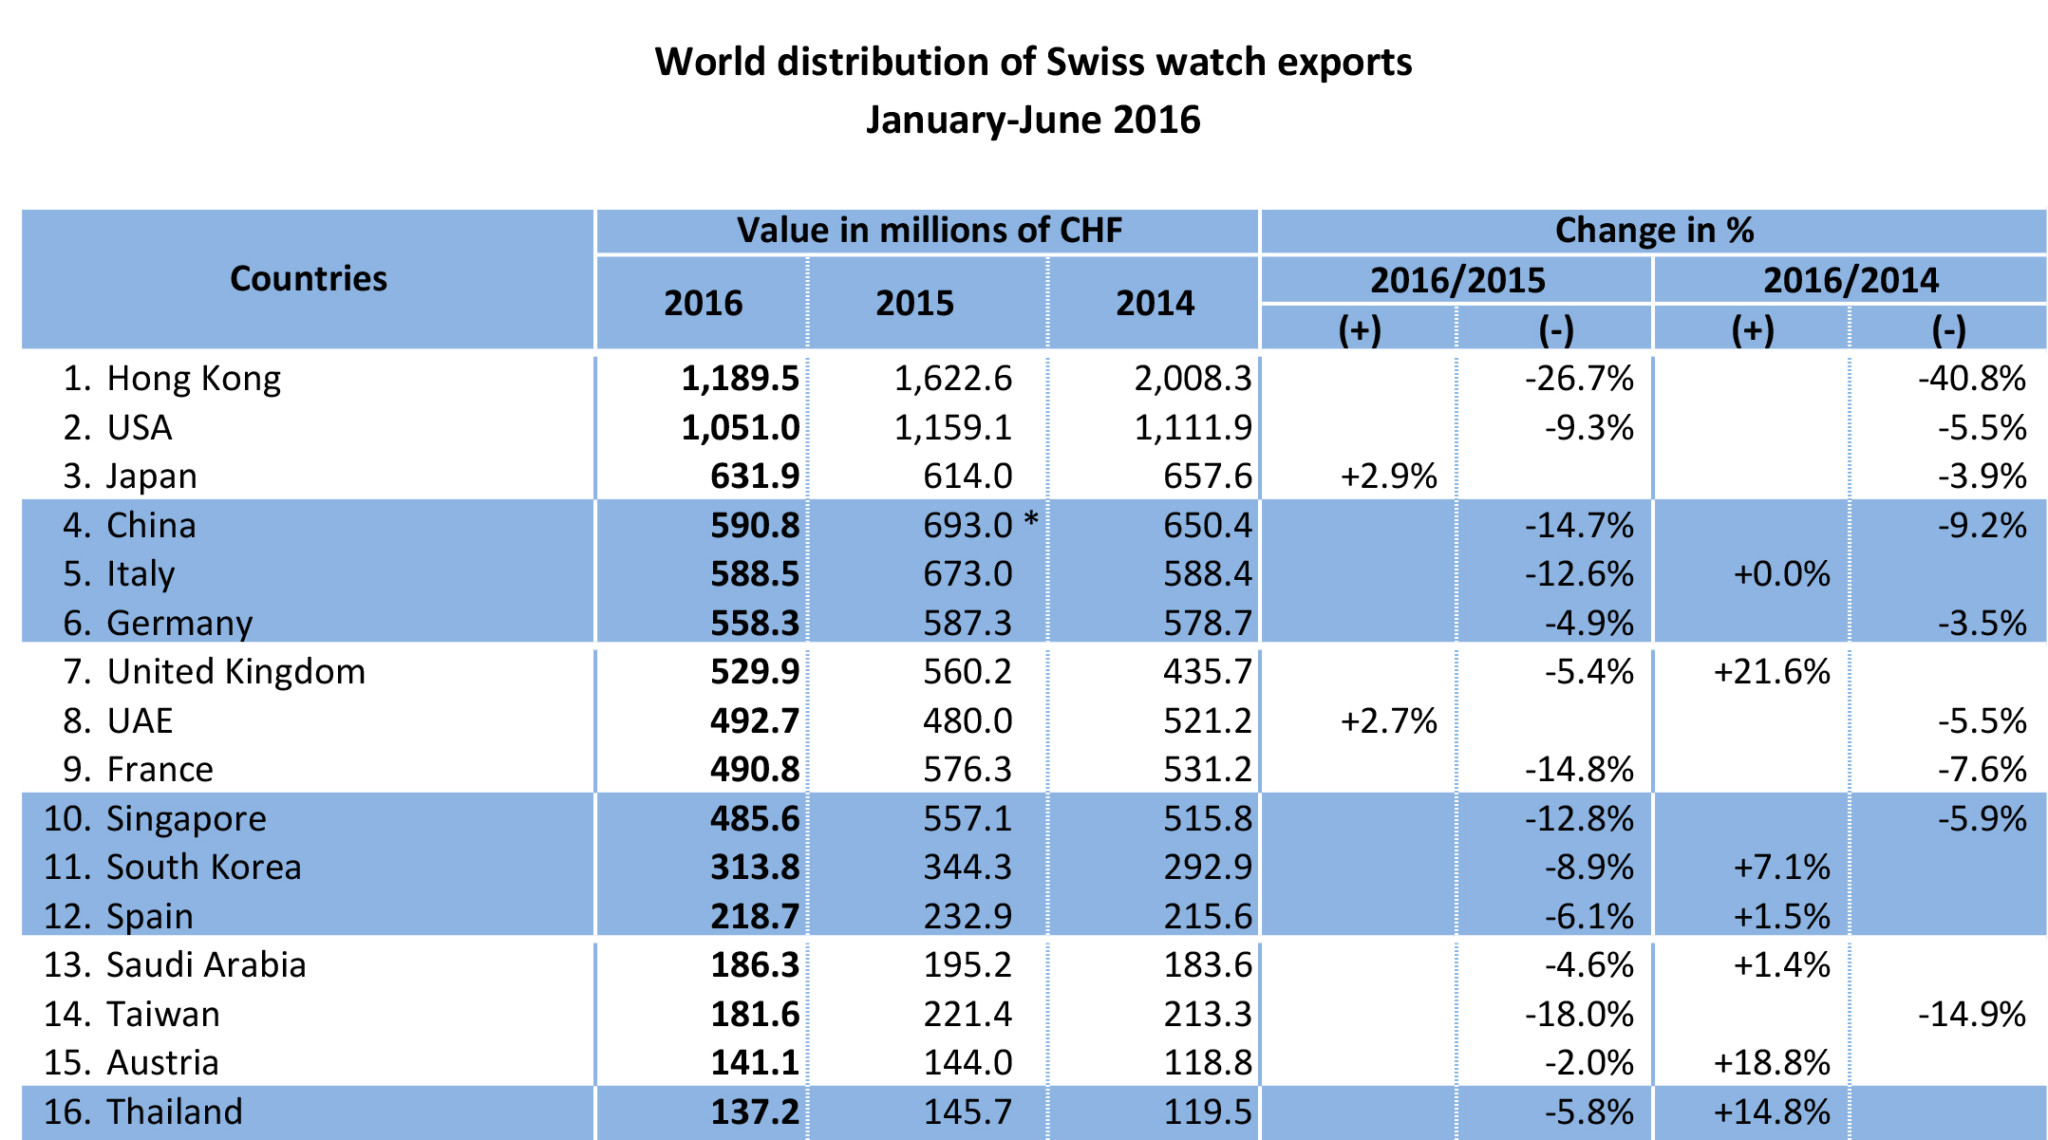 World Distribution of Swiss Watch Exports (June 2016)